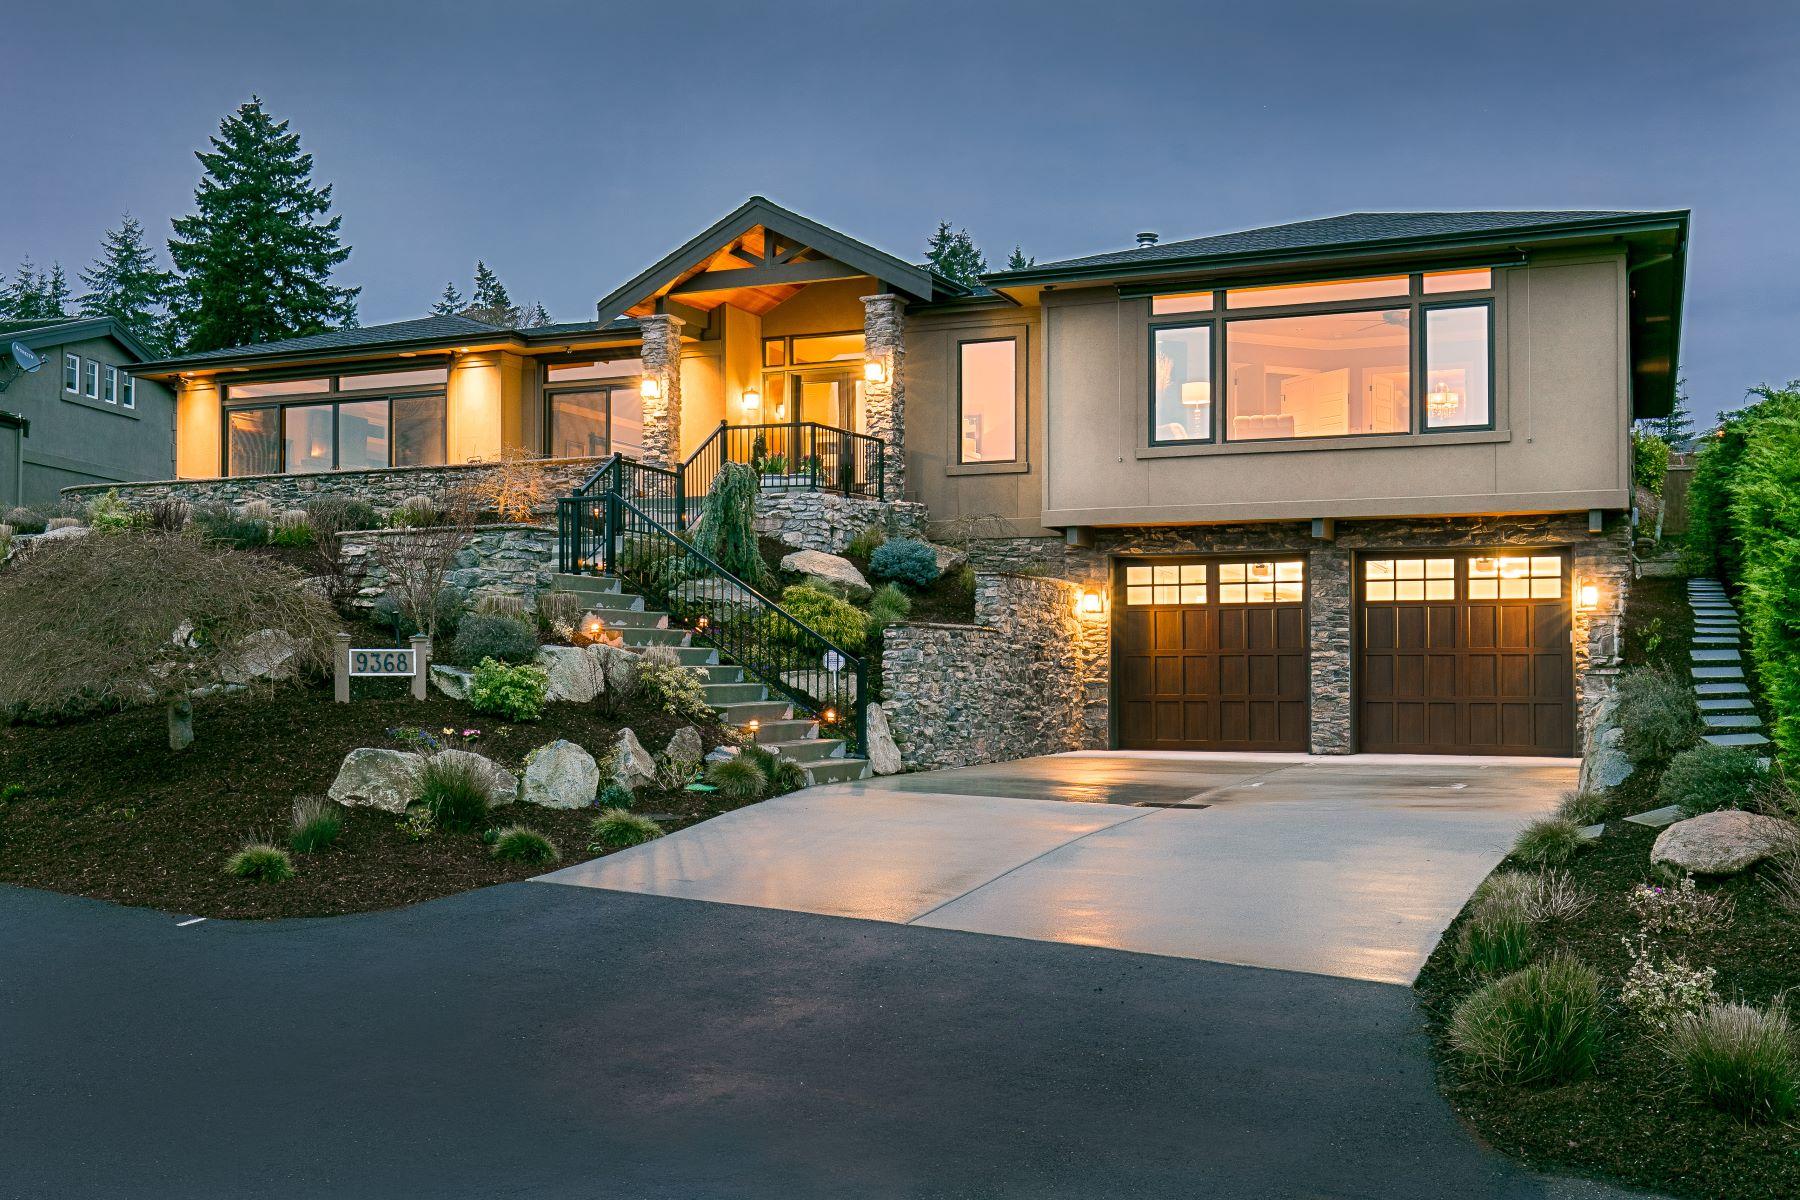 Single Family Home for Sale at Exquisite Vuecrest Estate 9368 Vineyard Crst Bellevue, Washington, 98004 United States